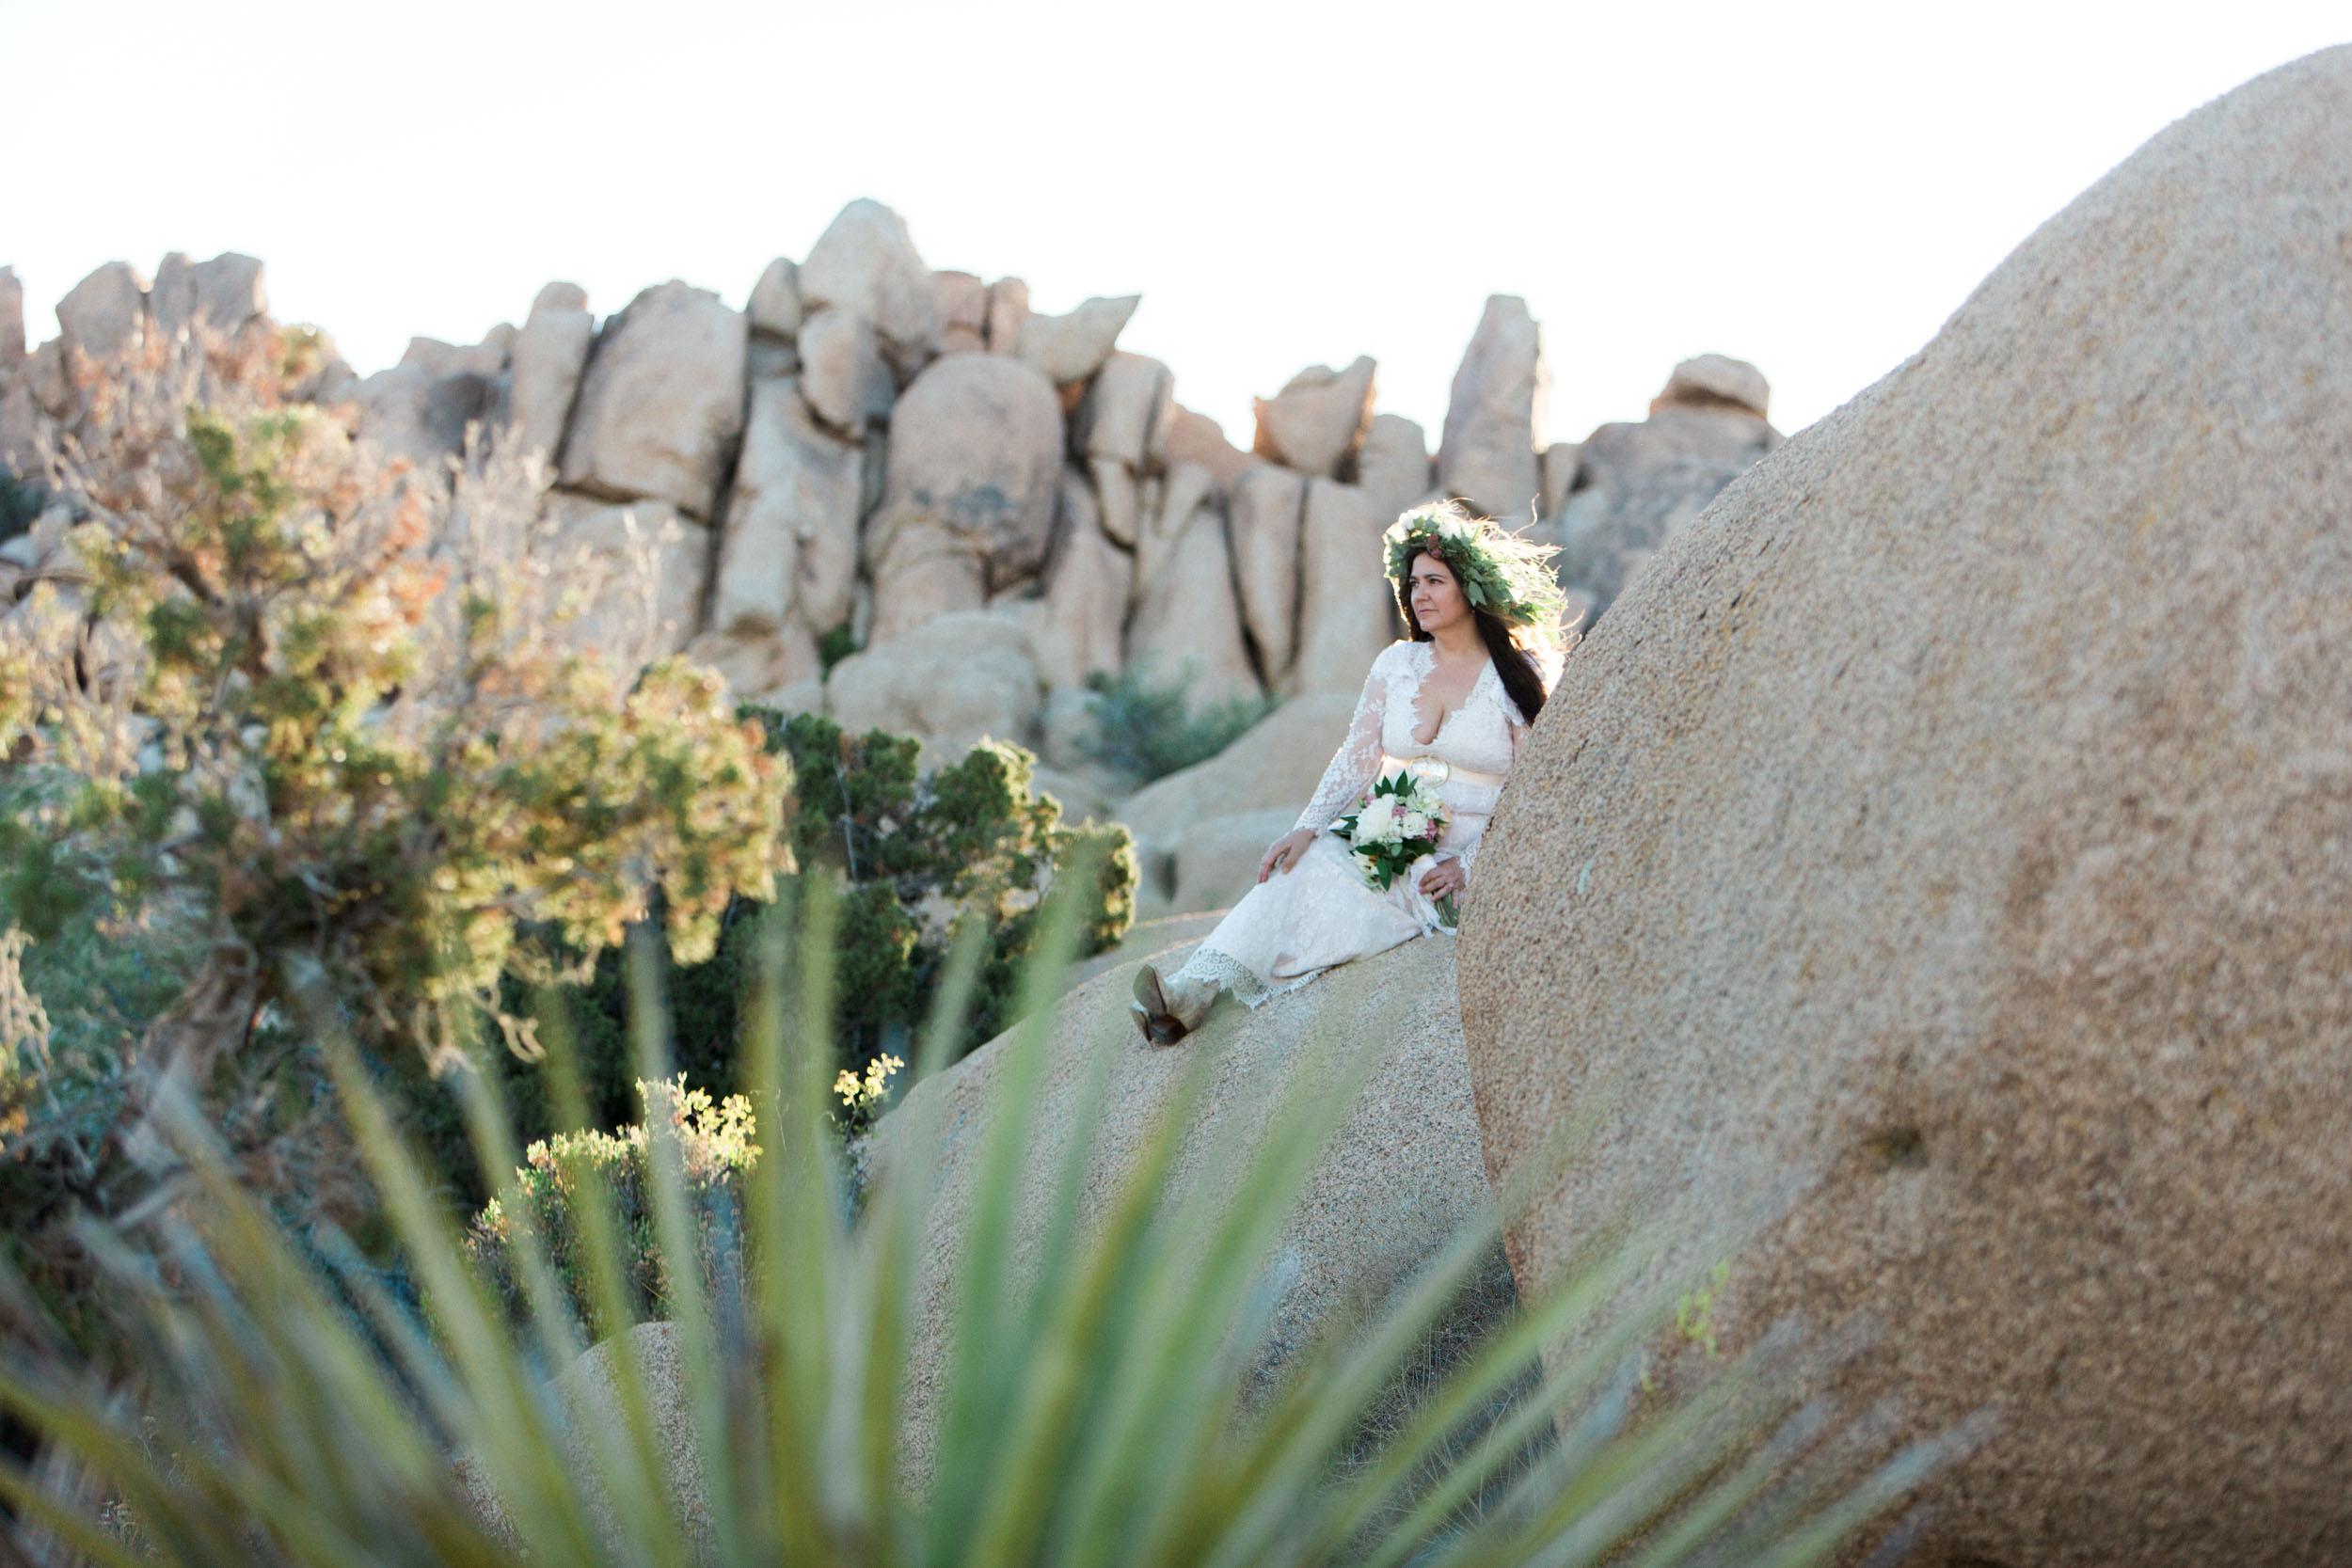 BKM-Photography-Joshua-Tree-Desert-Wedding-Elopement-0022.jpg